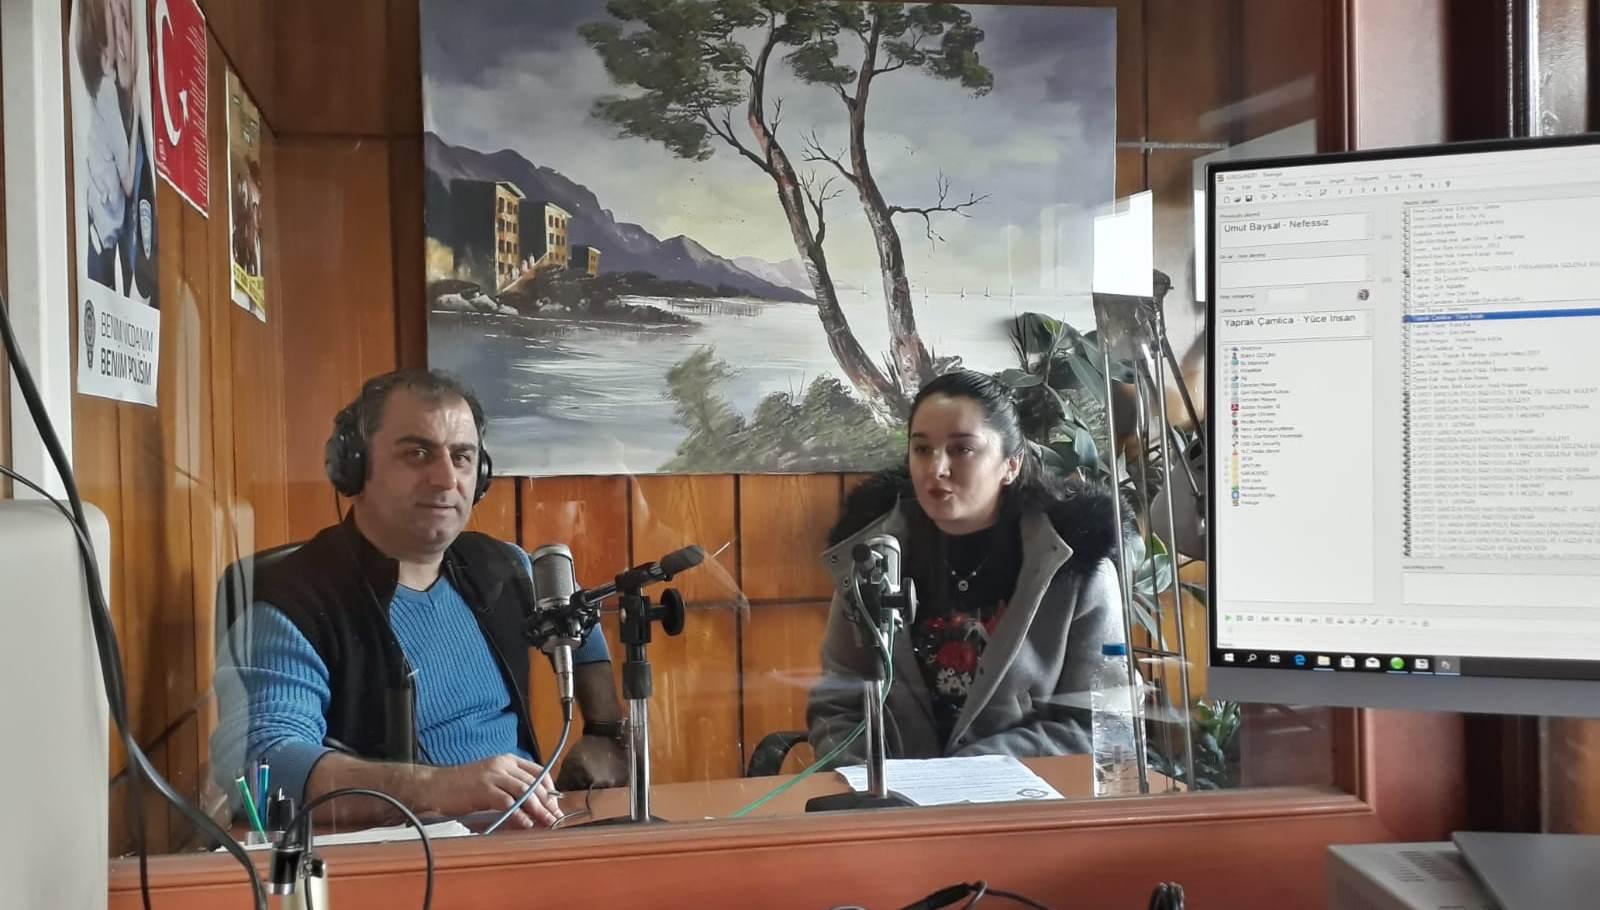 Polis Radyosunda Verem Konuşuldu